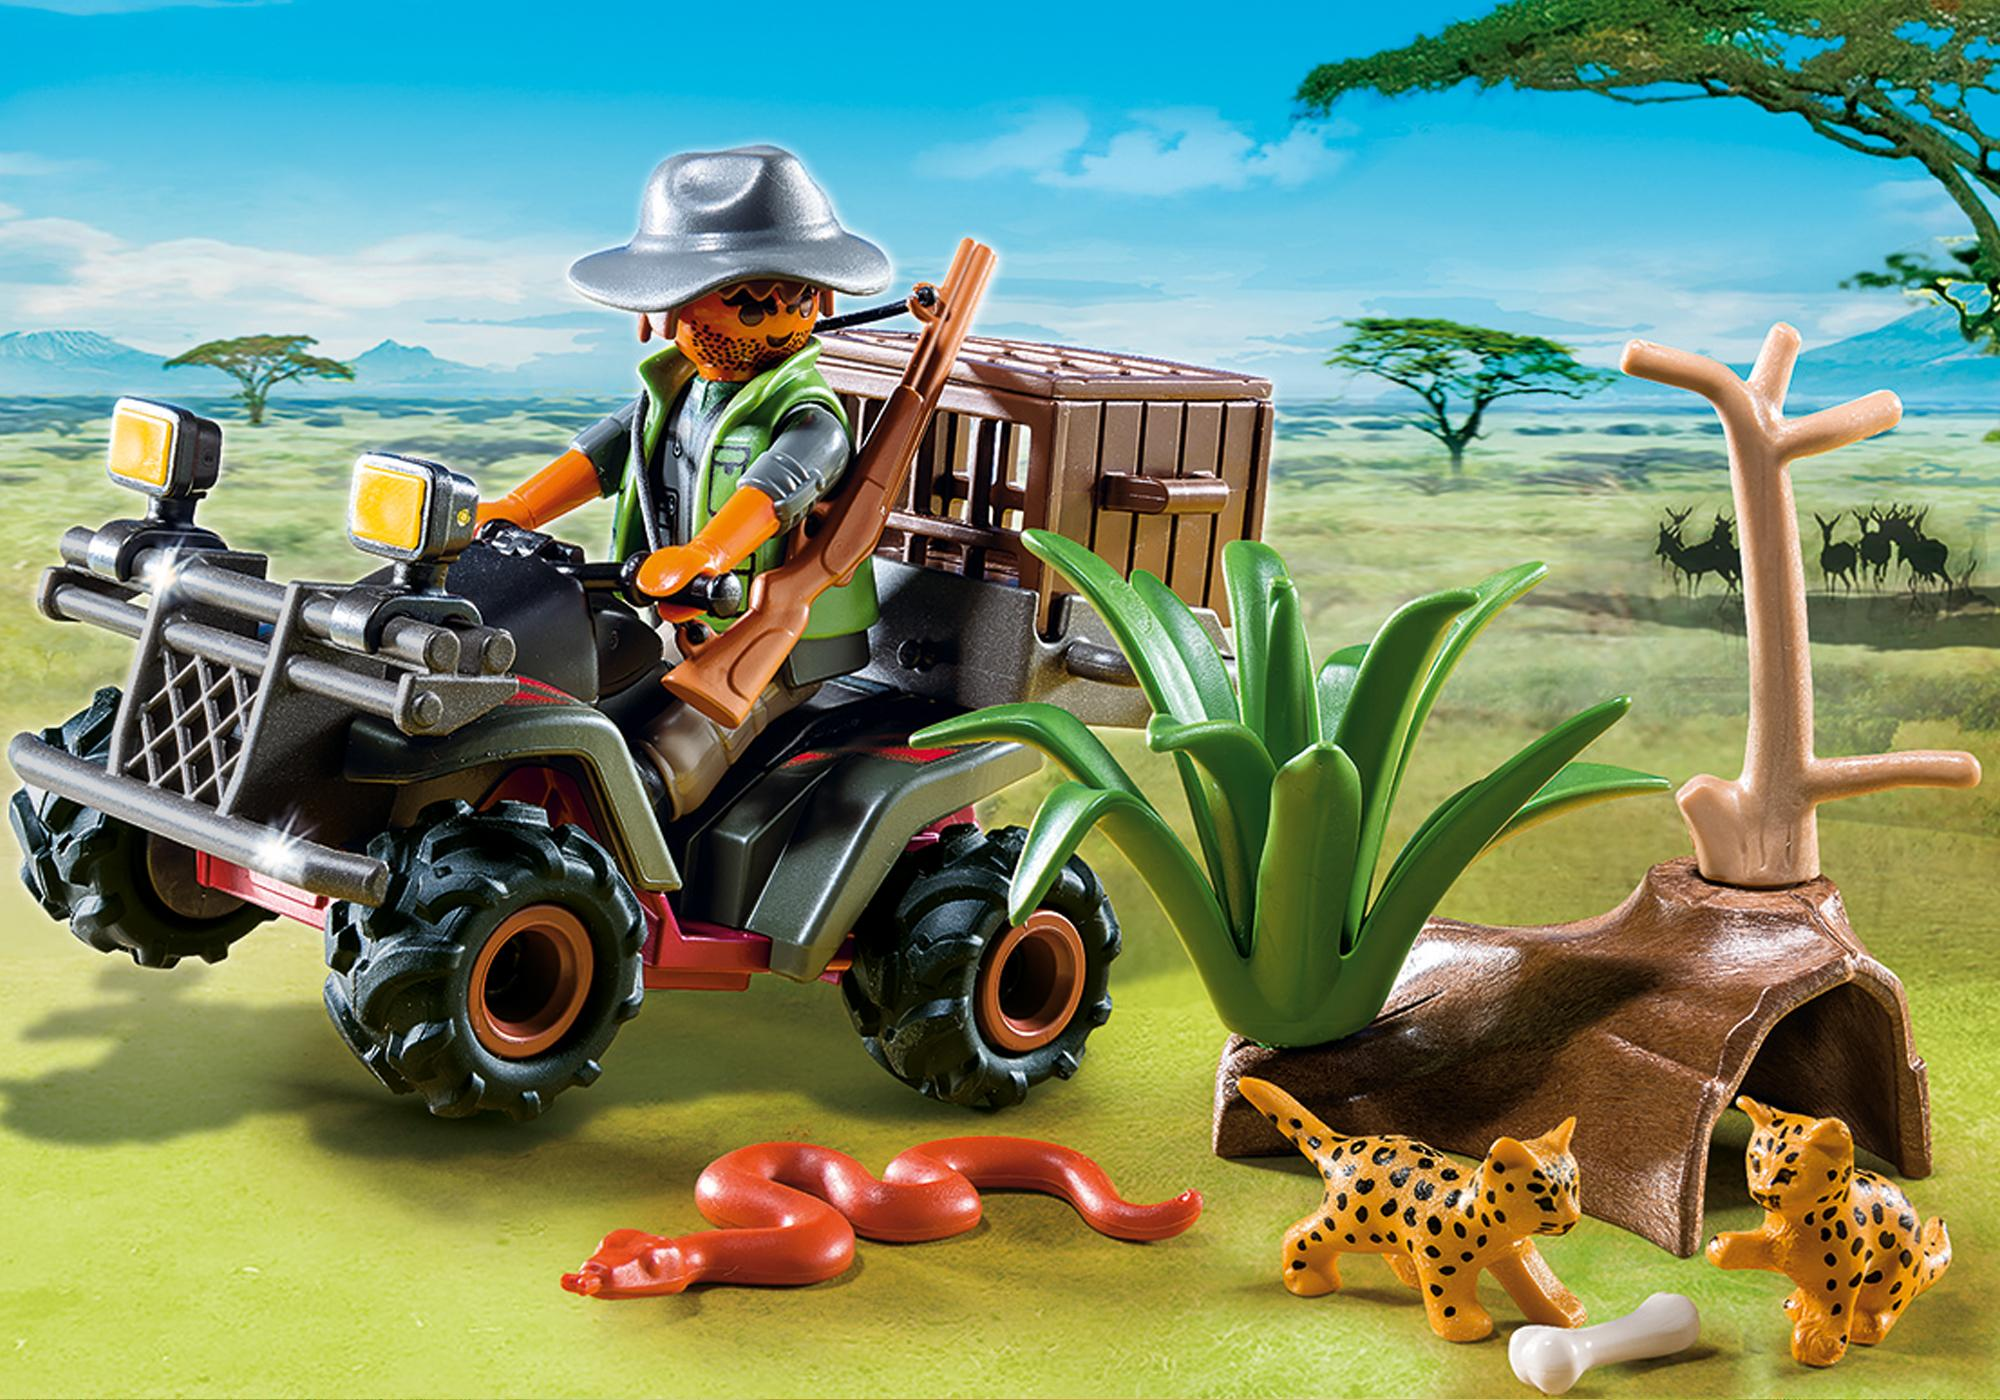 http://media.playmobil.com/i/playmobil/6939_product_detail/Bracconiere con quad